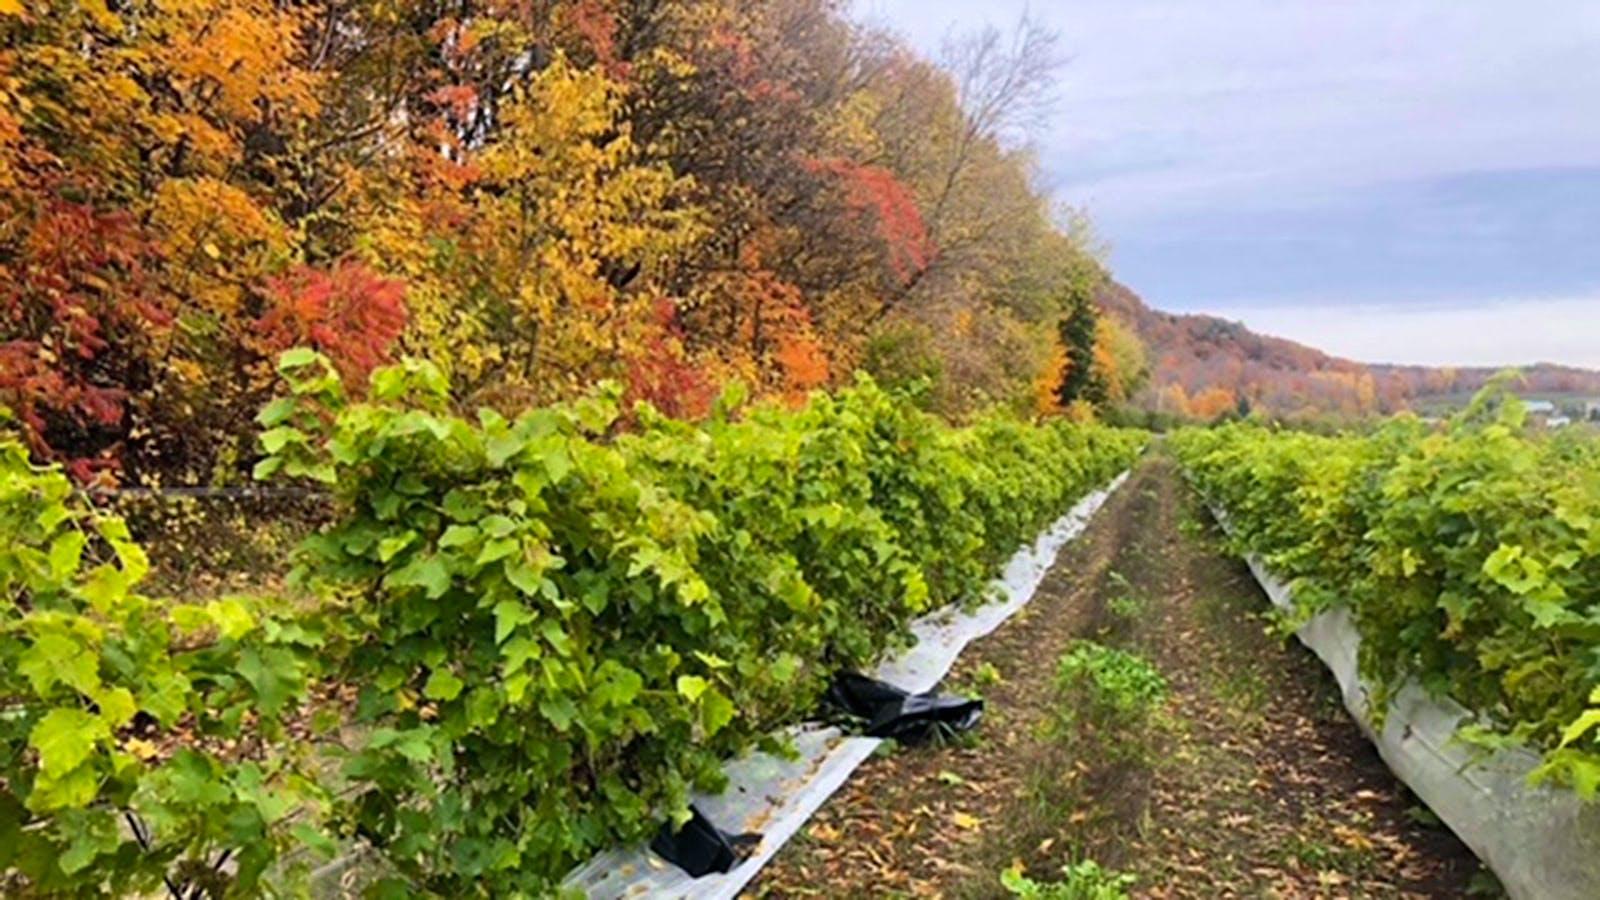 Vanished Grapes and Burrowing Burglars: Wine Crime Unseen